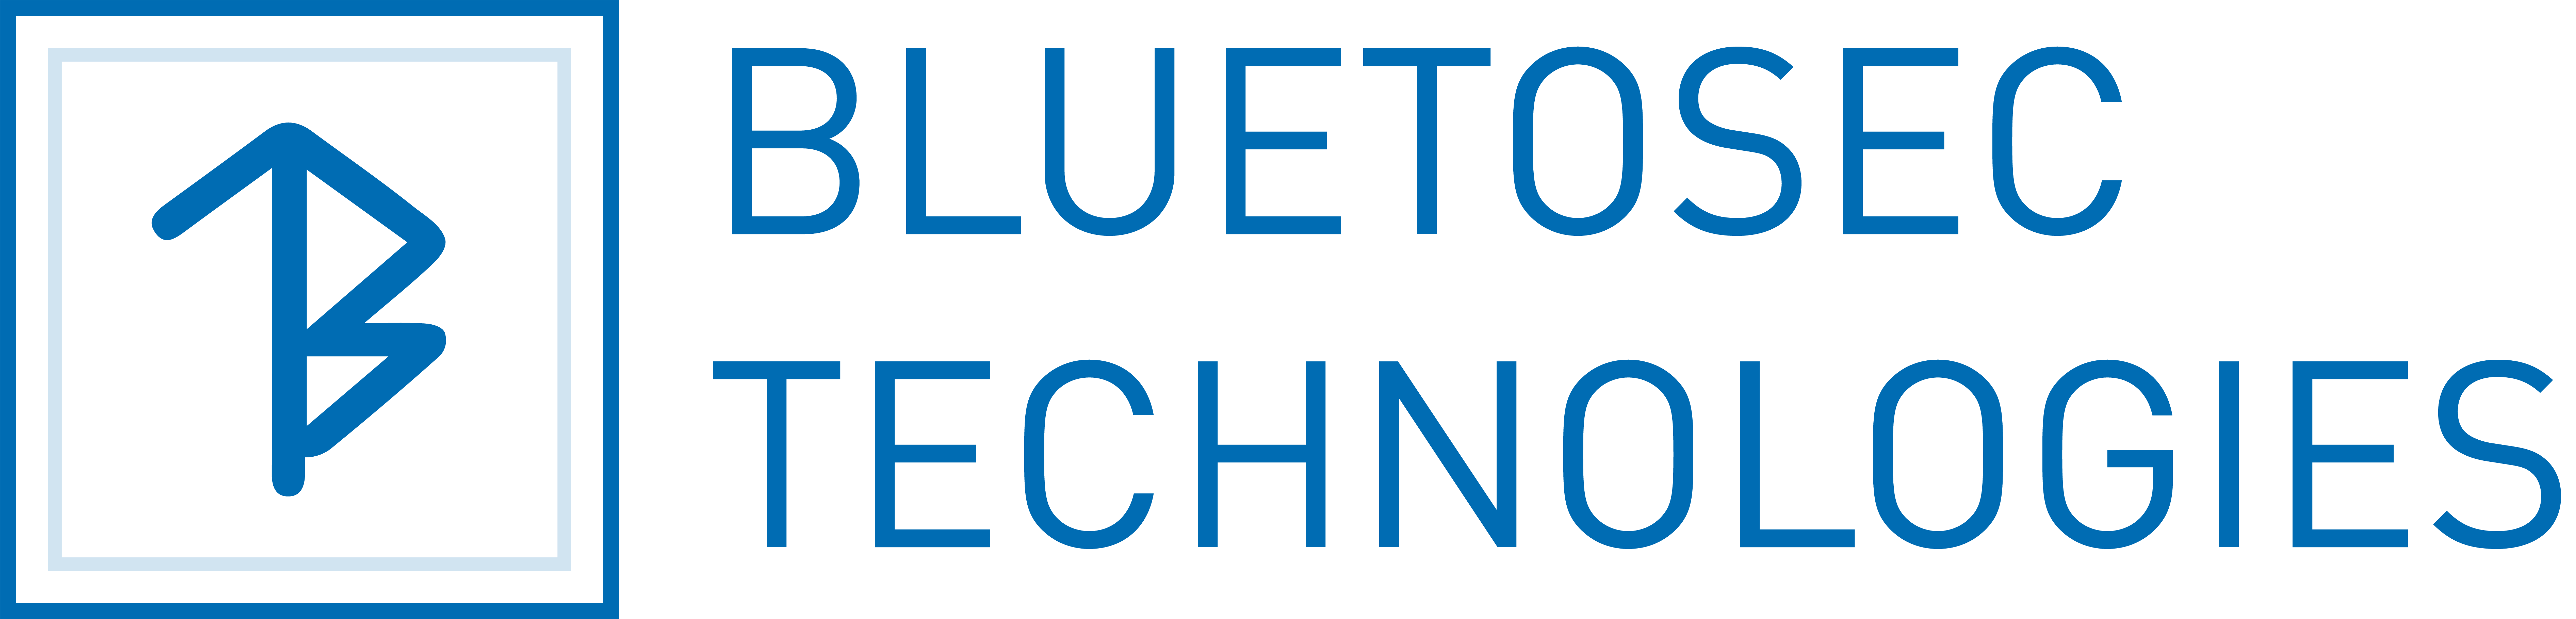 Bluetosec-Technologies Logo